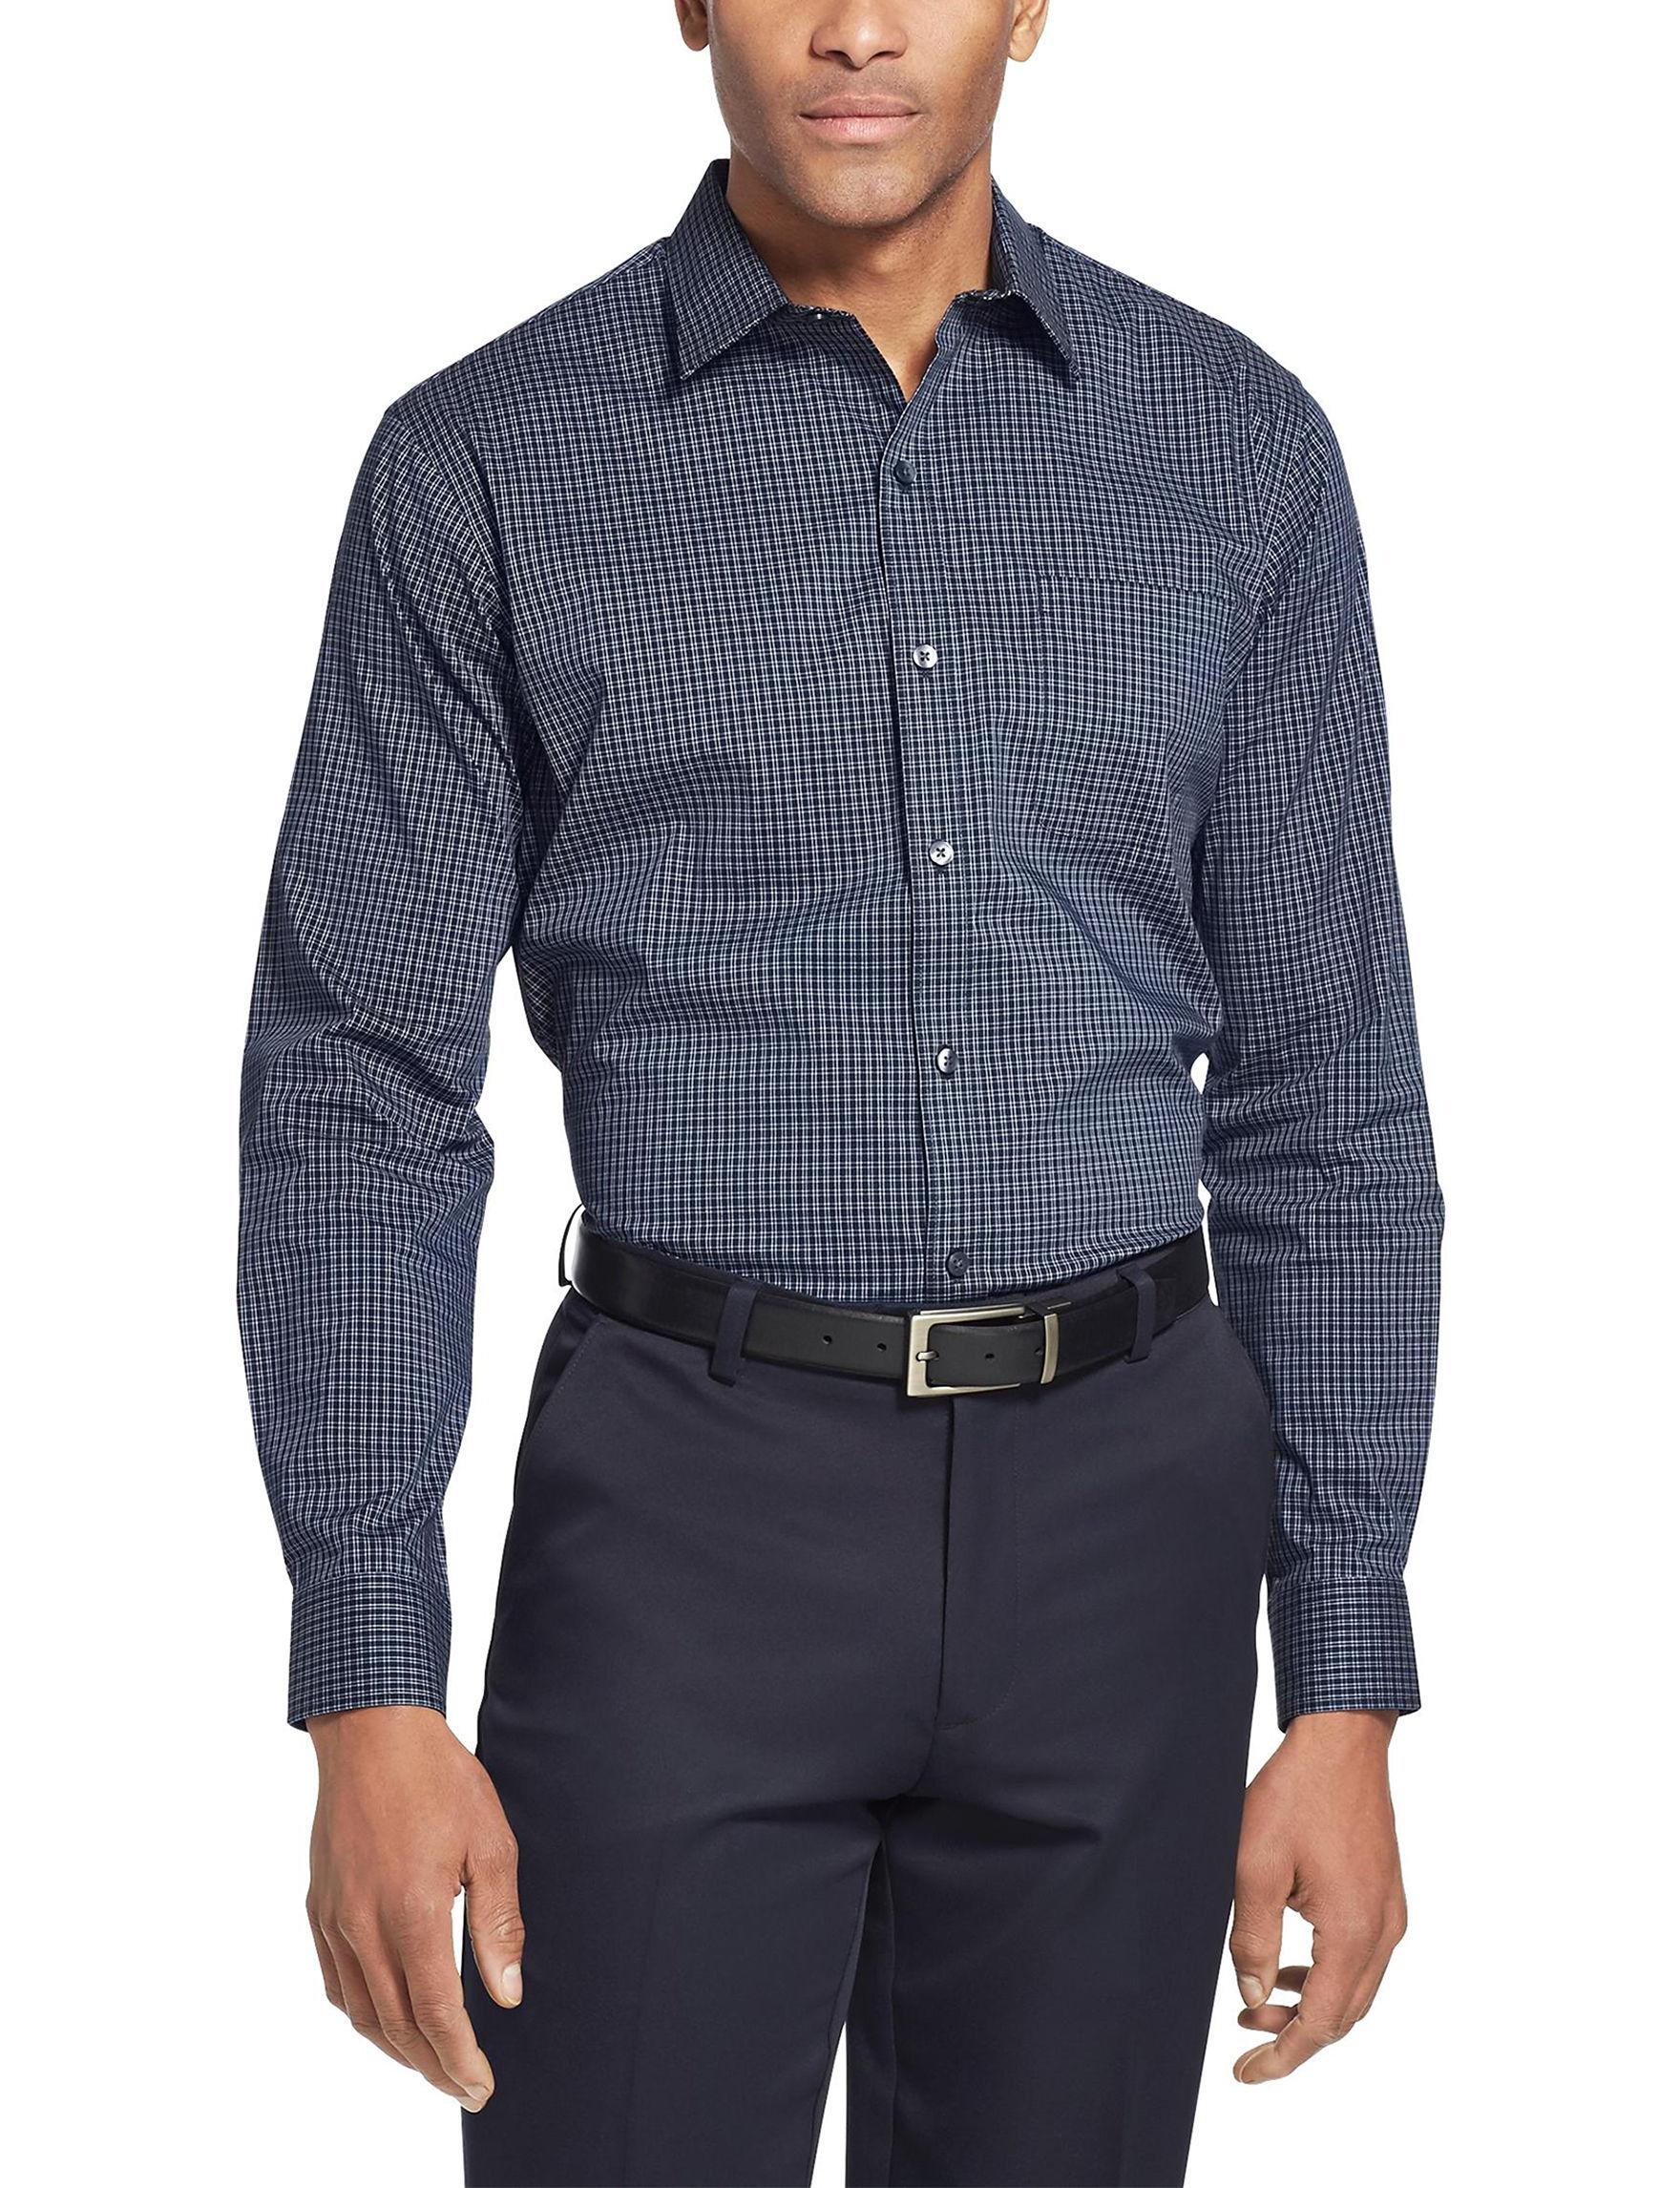 Van Heusen Navy / White Casual Button Down Shirts